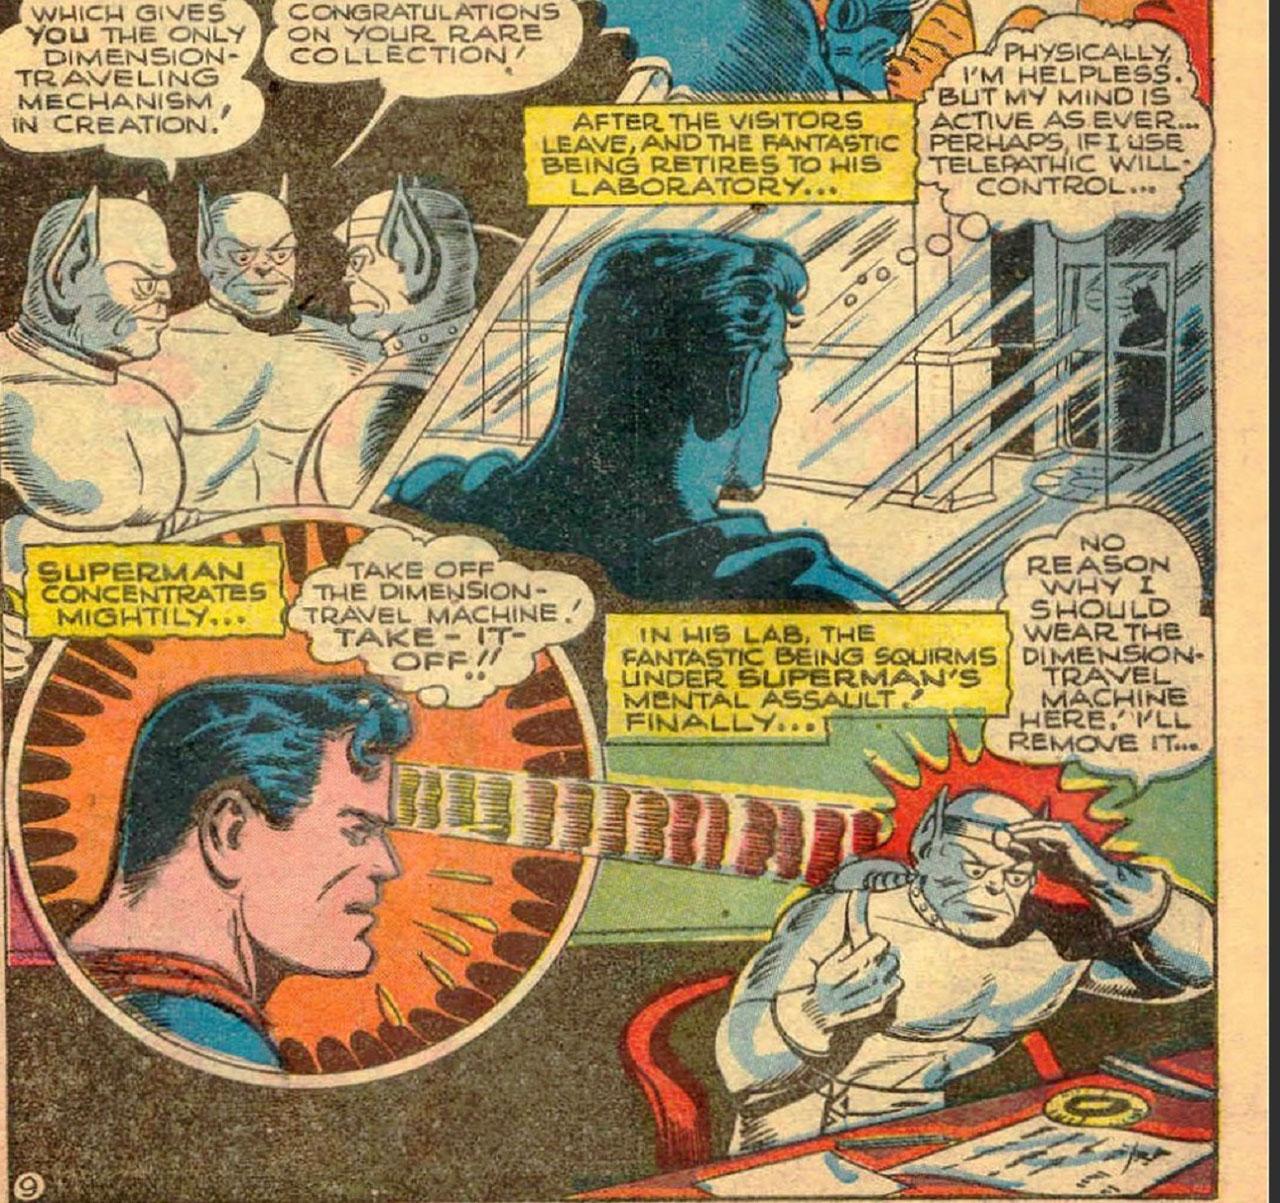 superman-mind-control.jpg